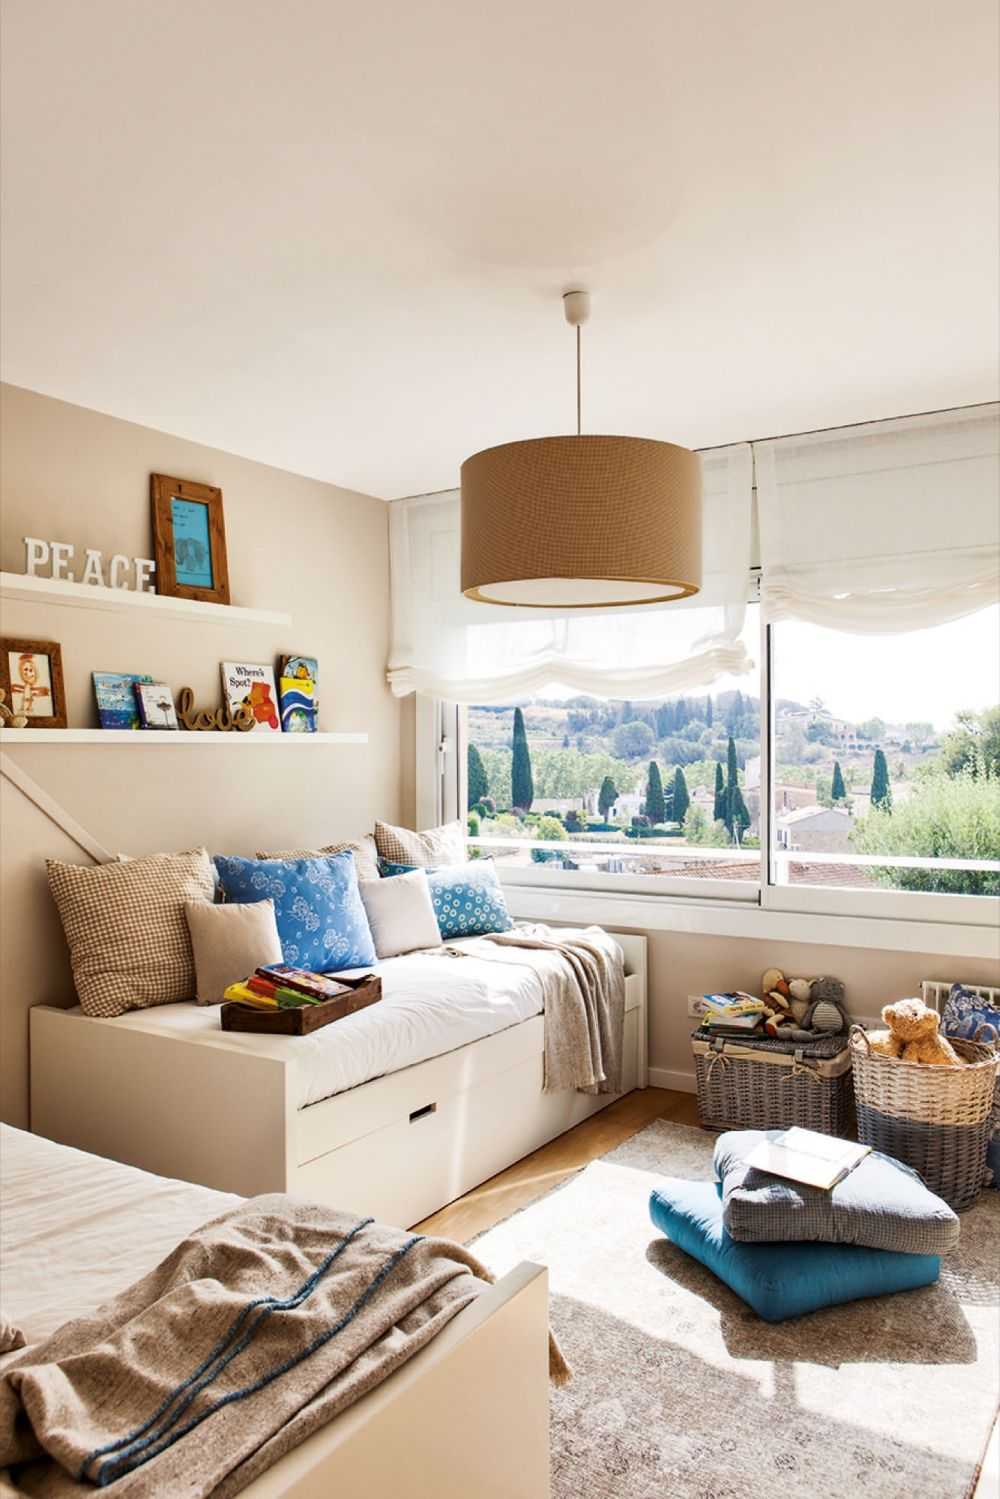 adelaparvu.com despre casa cu gradina, accente marine, designer Jeanette Dresing, Foto Feran Freixa (27)